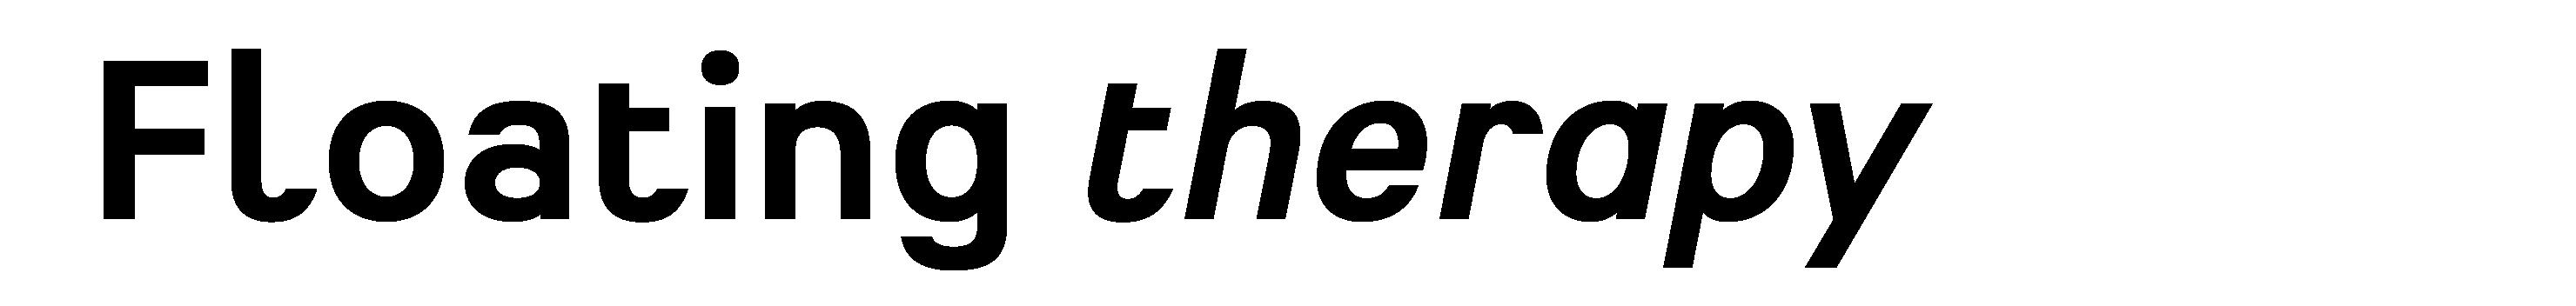 Typeface Heimat Sans D11 Atlas Font Foundry